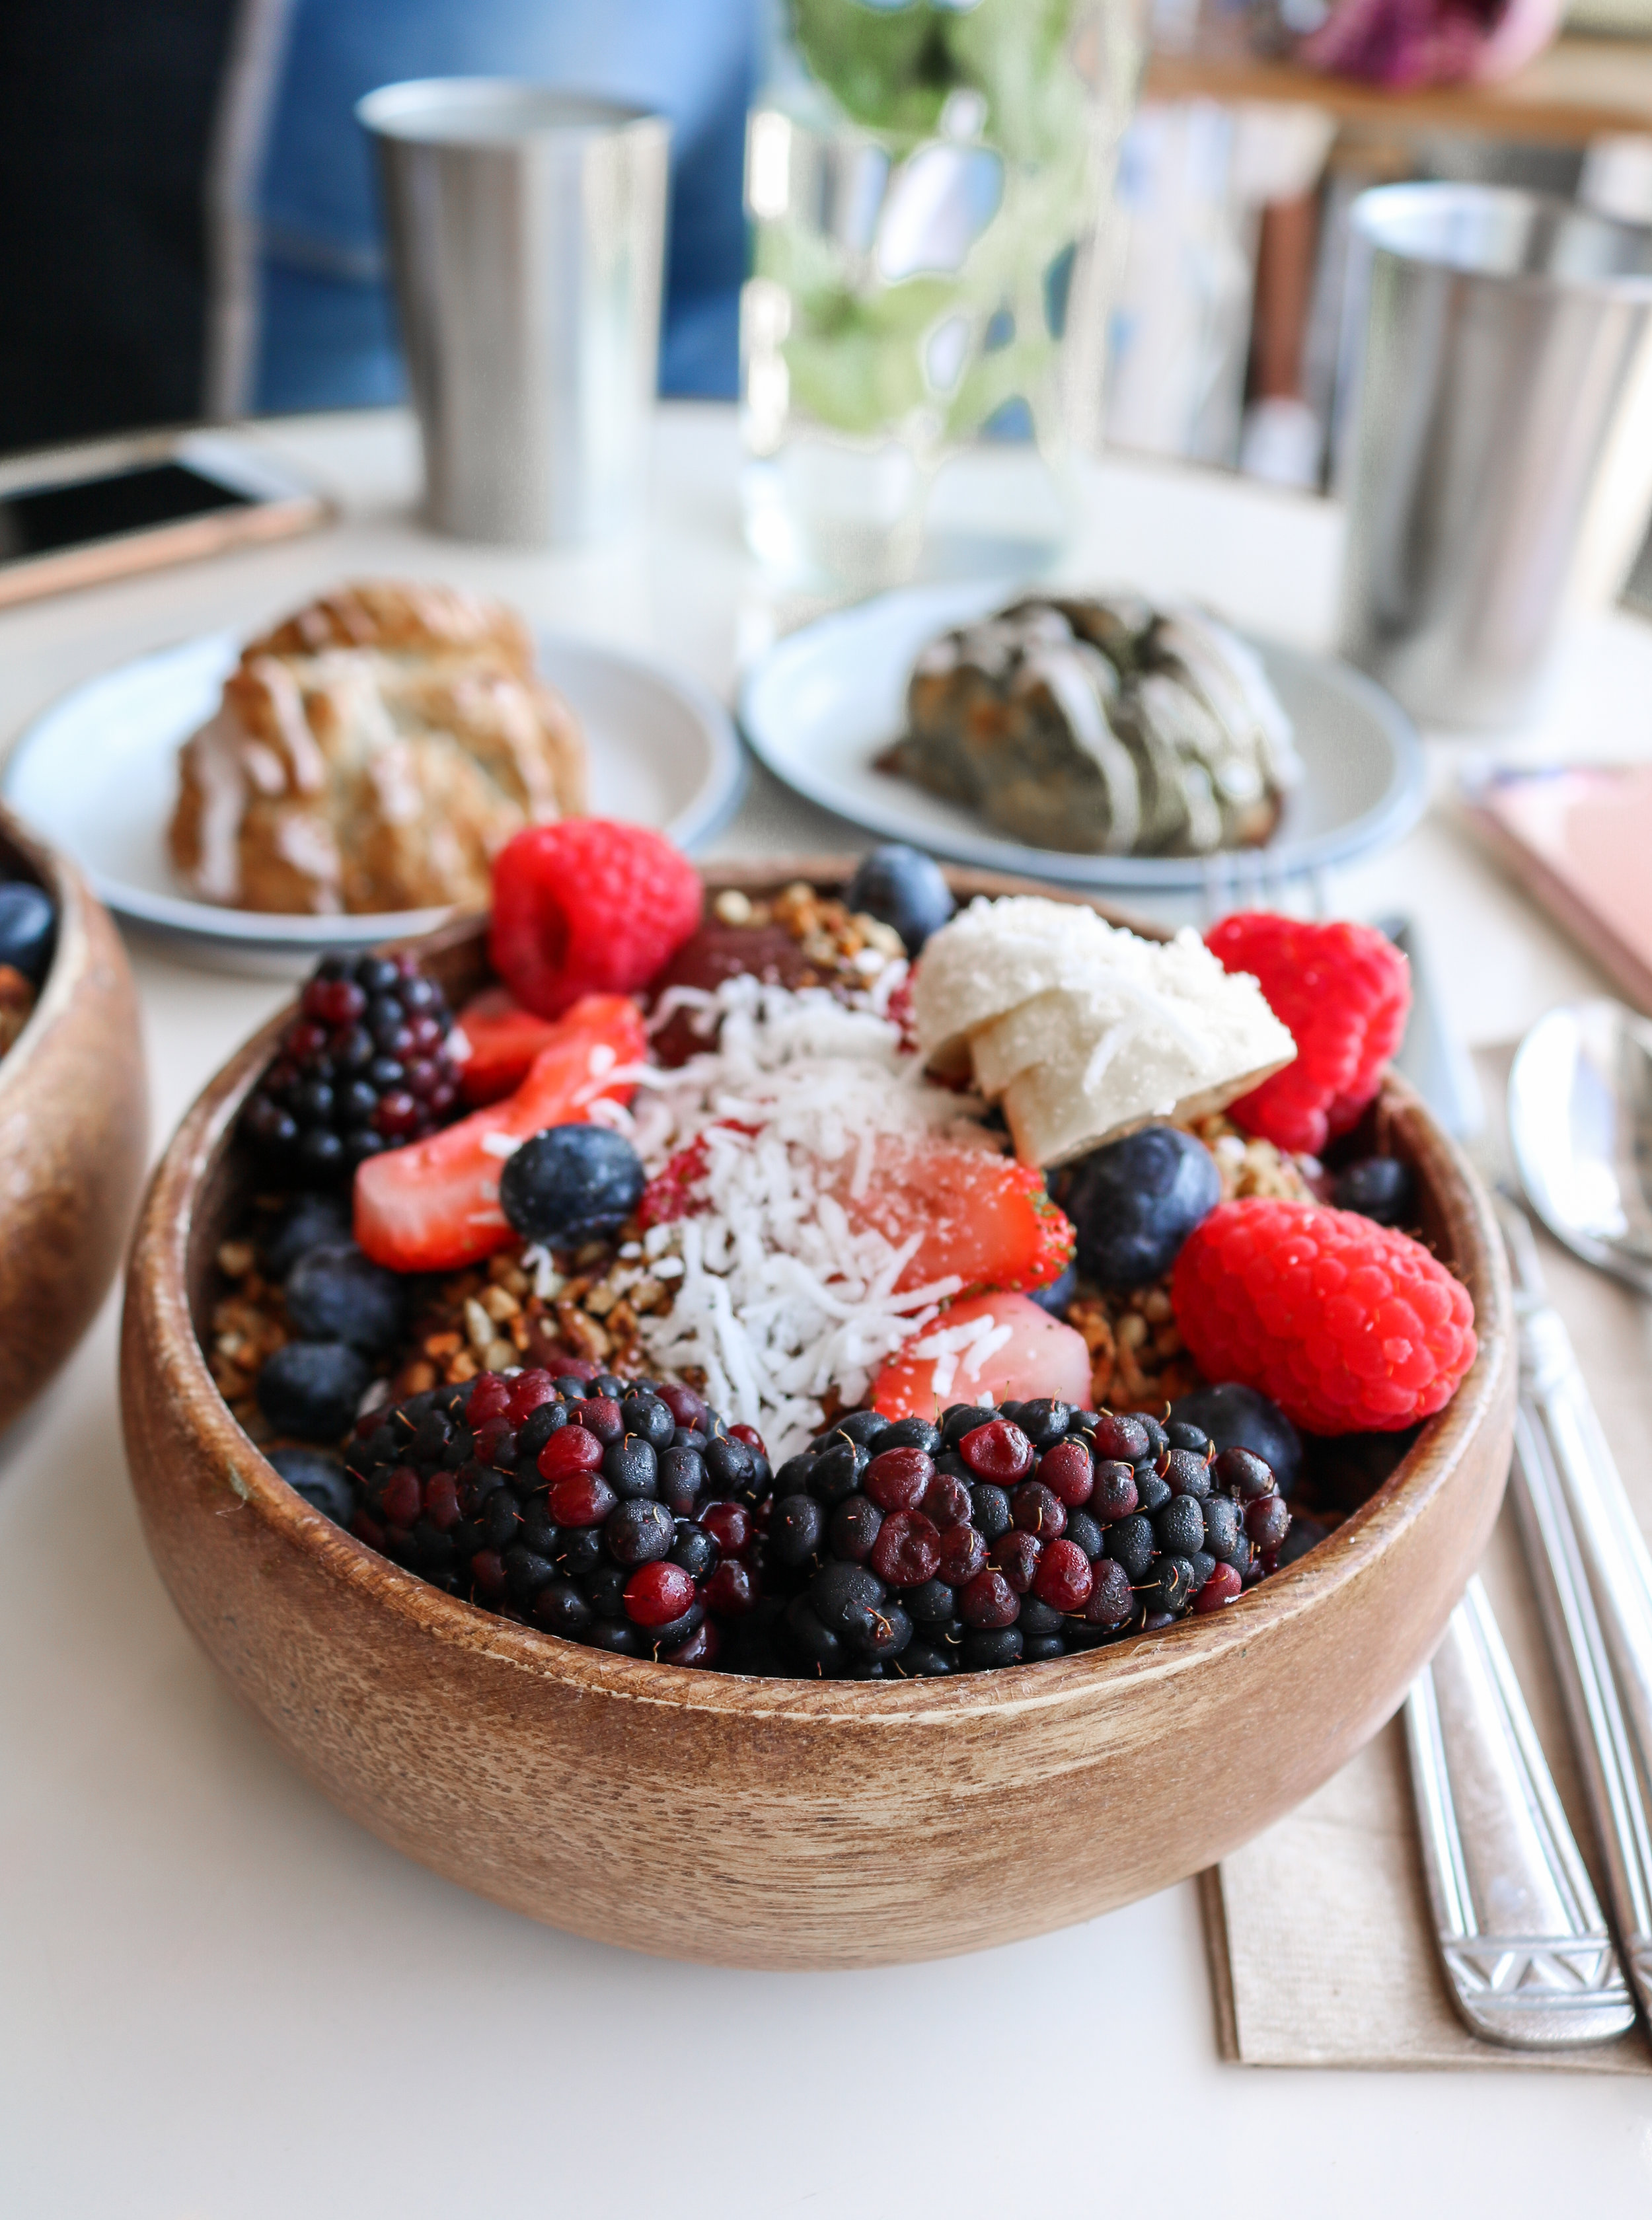 The Hungarian Brunette LA restaurants - Brunch and breakfast, The Butcher's Daughter Venice (9 of 10).jpg